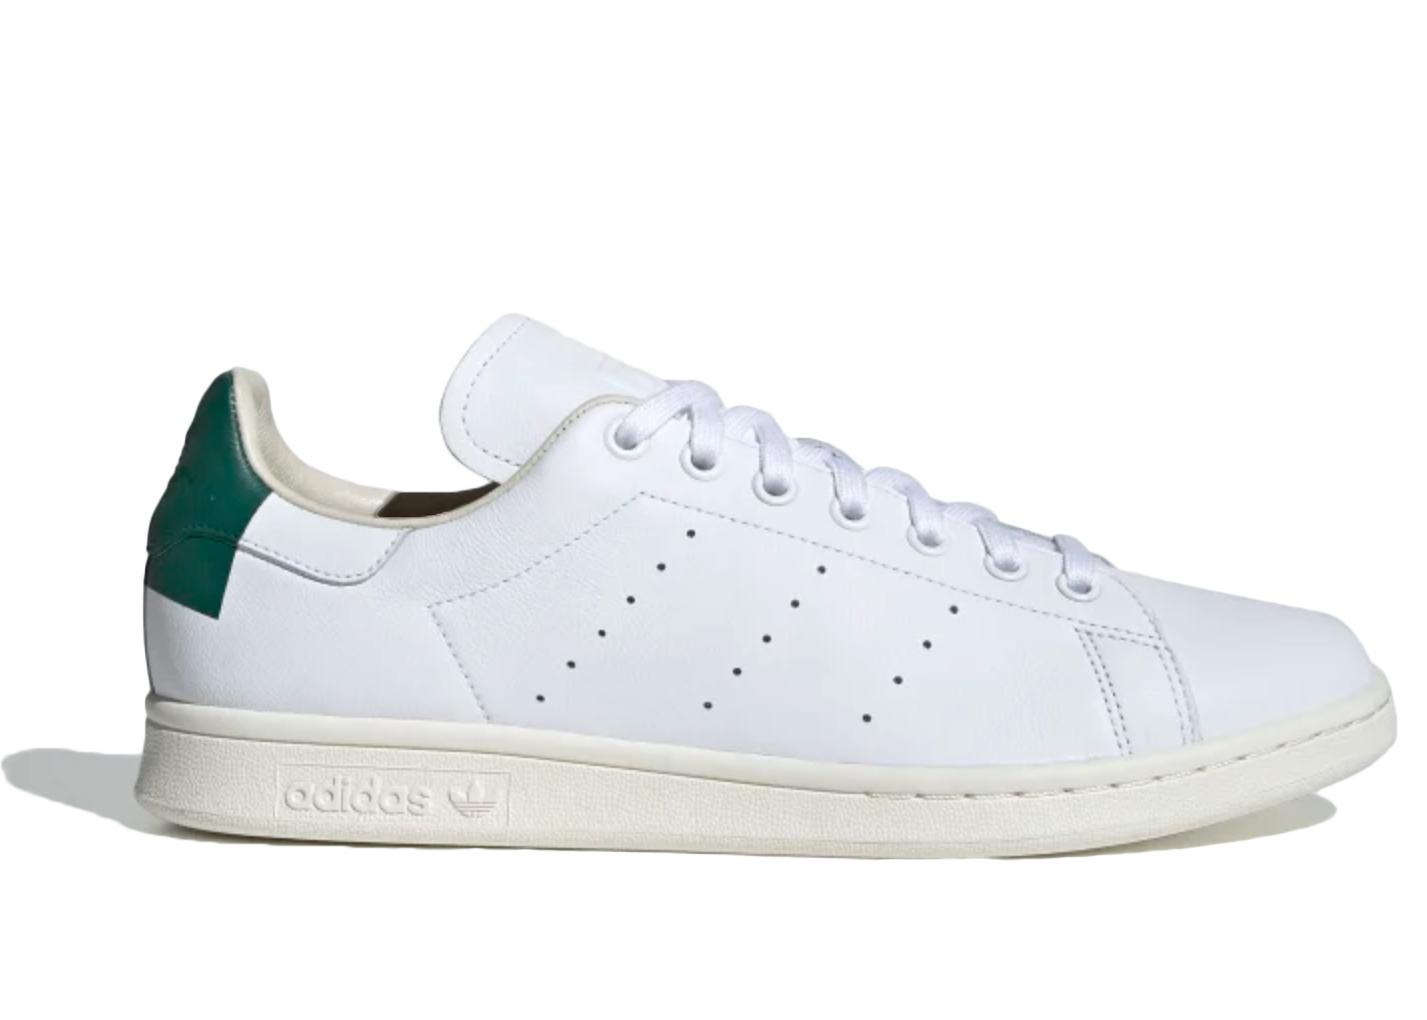 adidas stan smith updt - white / green